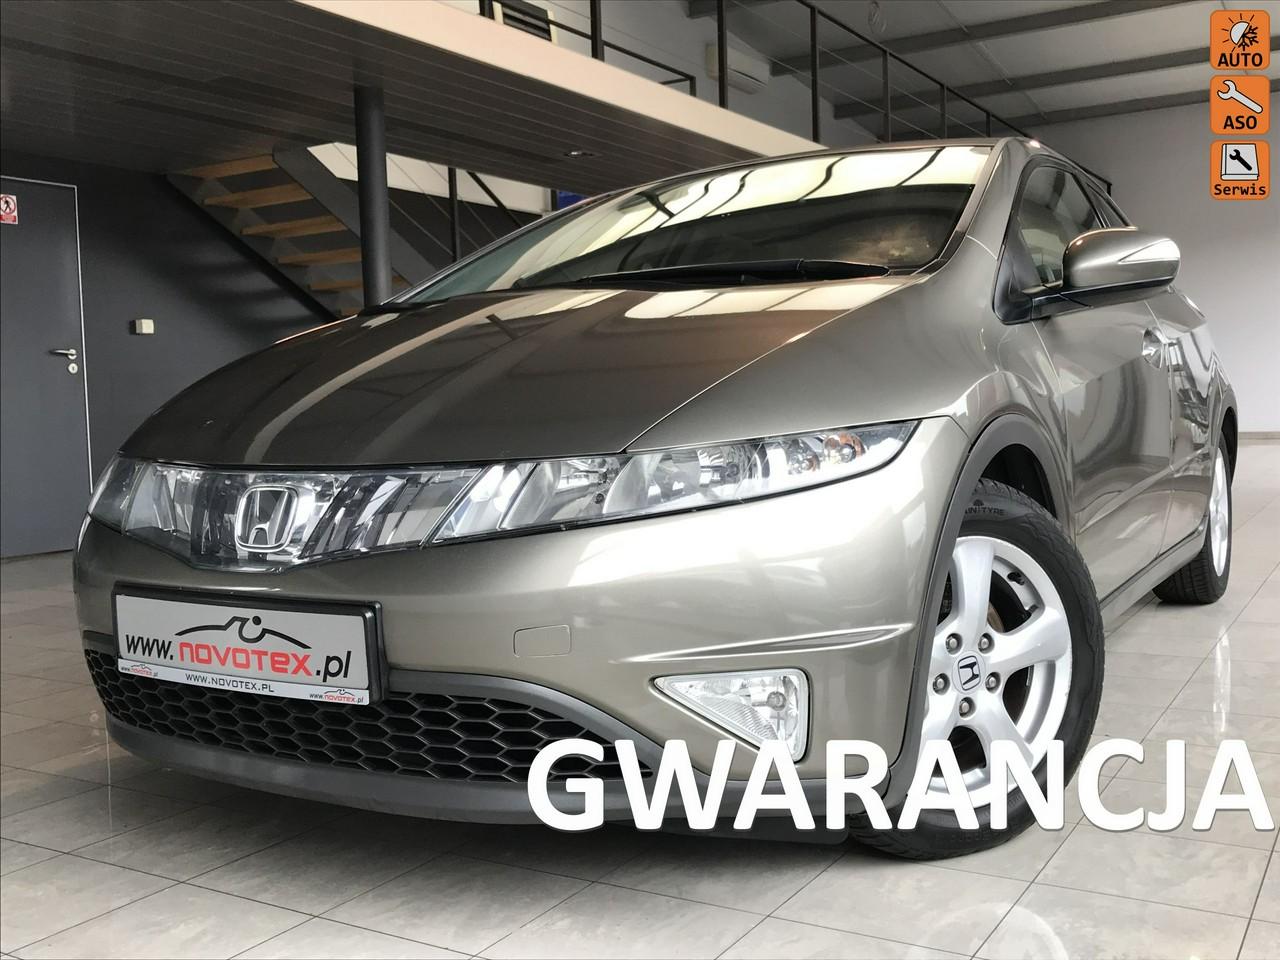 Honda Civic 1.8VVTI*Comfort*klimatronik*ALU 16*bezwypadek*serwis ASO*Gwarancja VIP